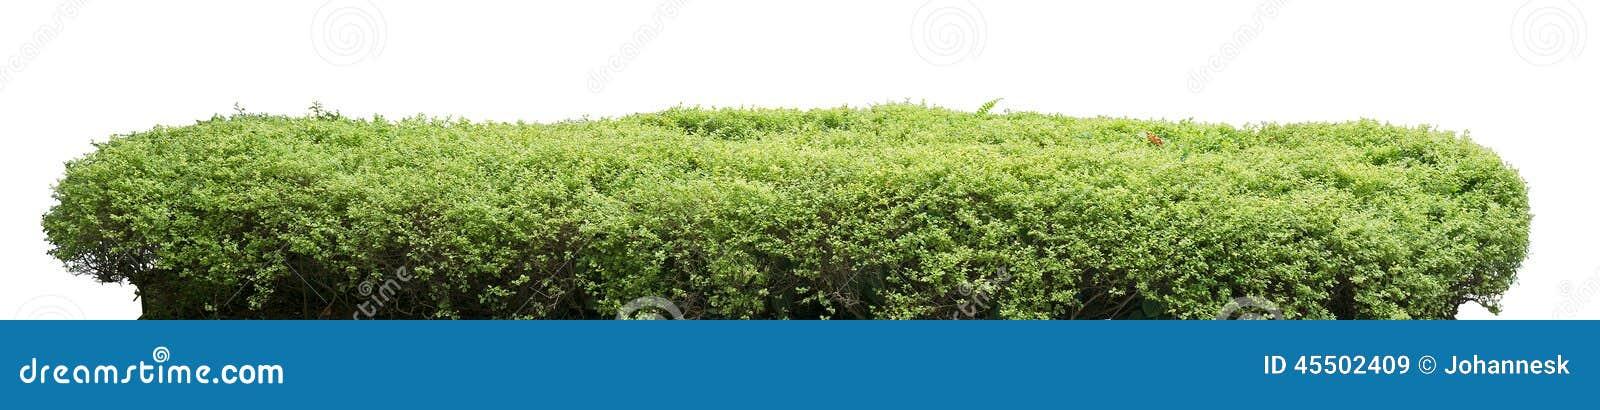 Загородка кустарника